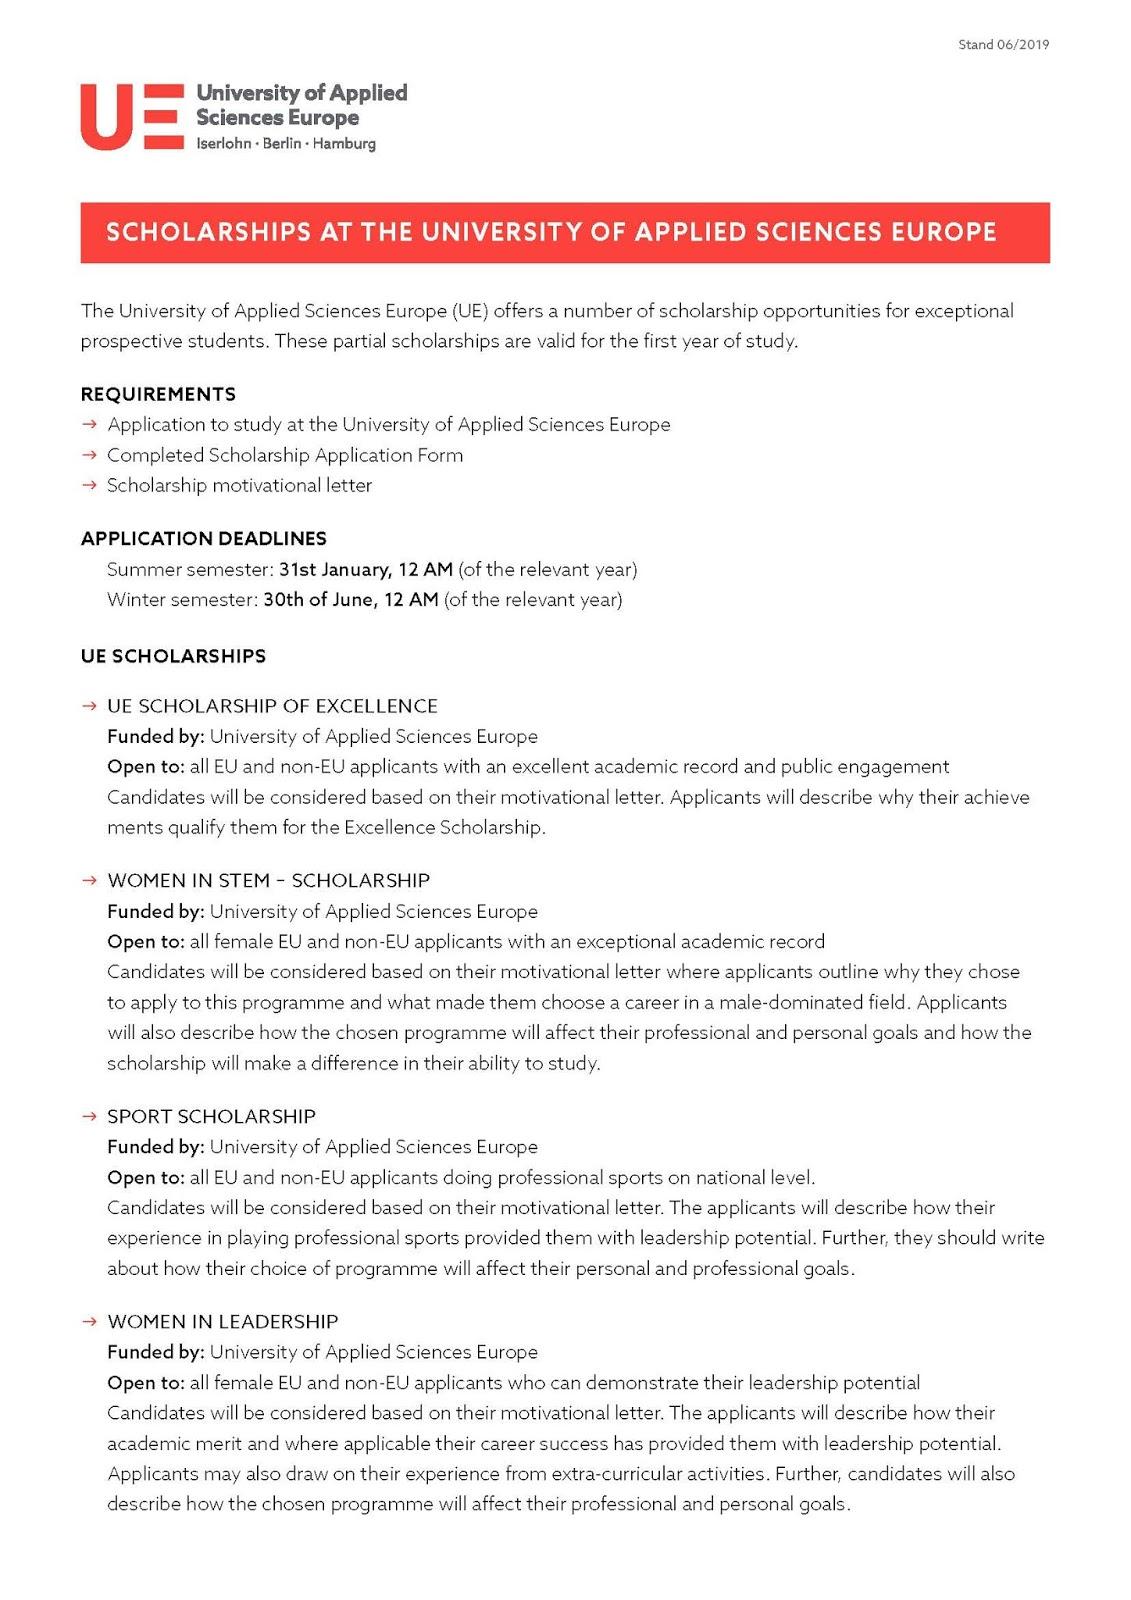 UNIVERSITY OF APPLIED SCIENCES EUROPE (UE) SCHOLARSHIPS